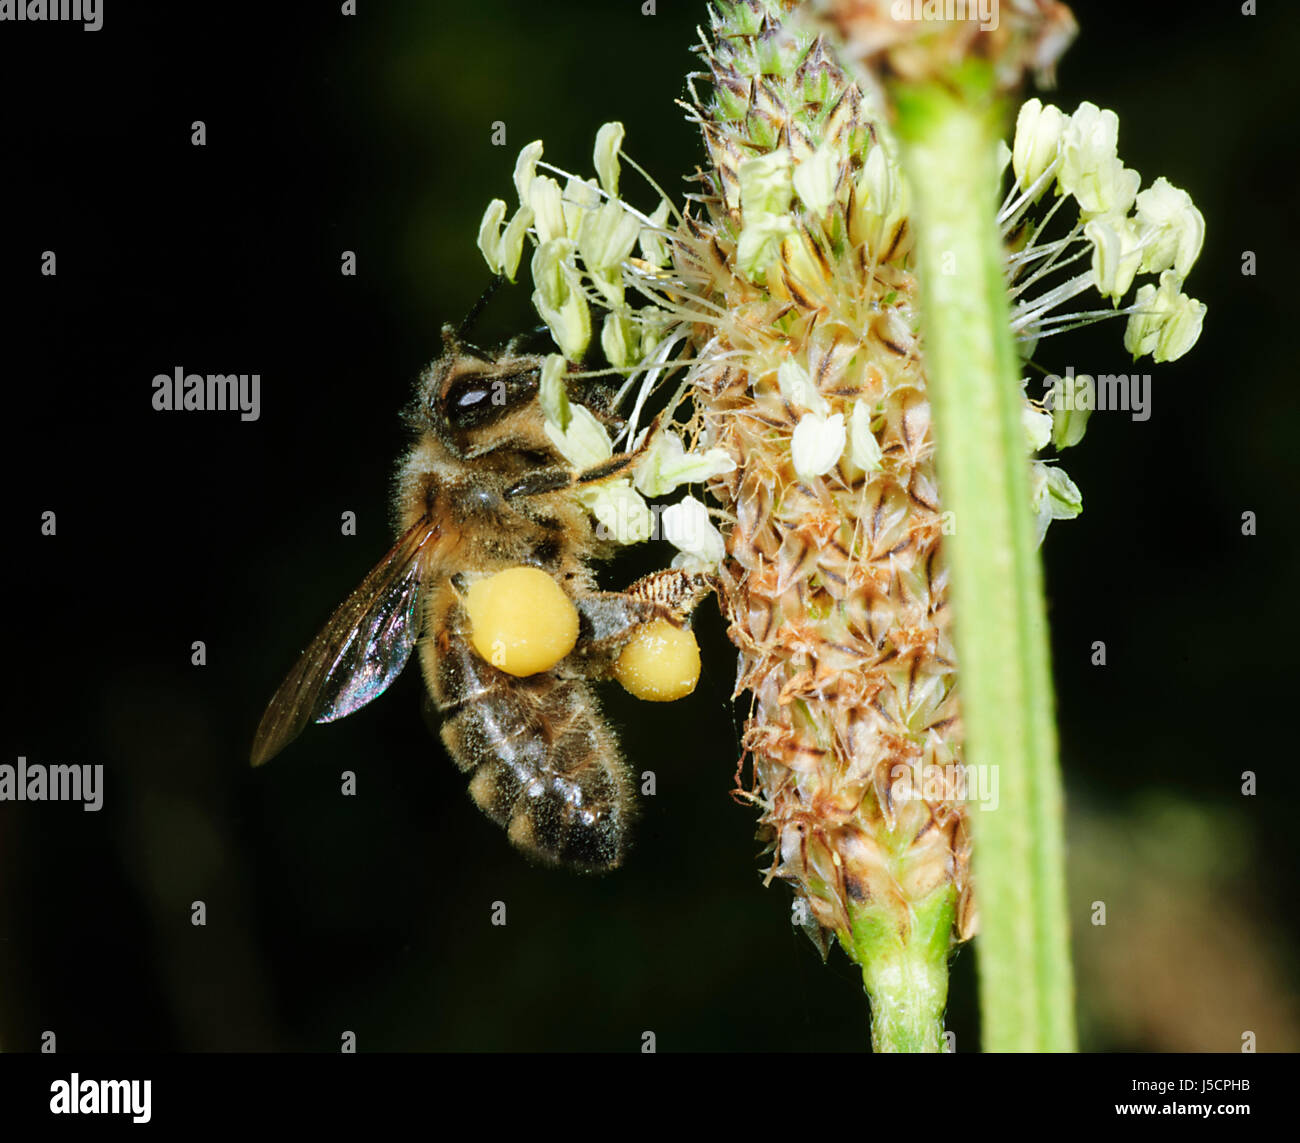 honey-bee-apis-mellifera-with-pollen-sac